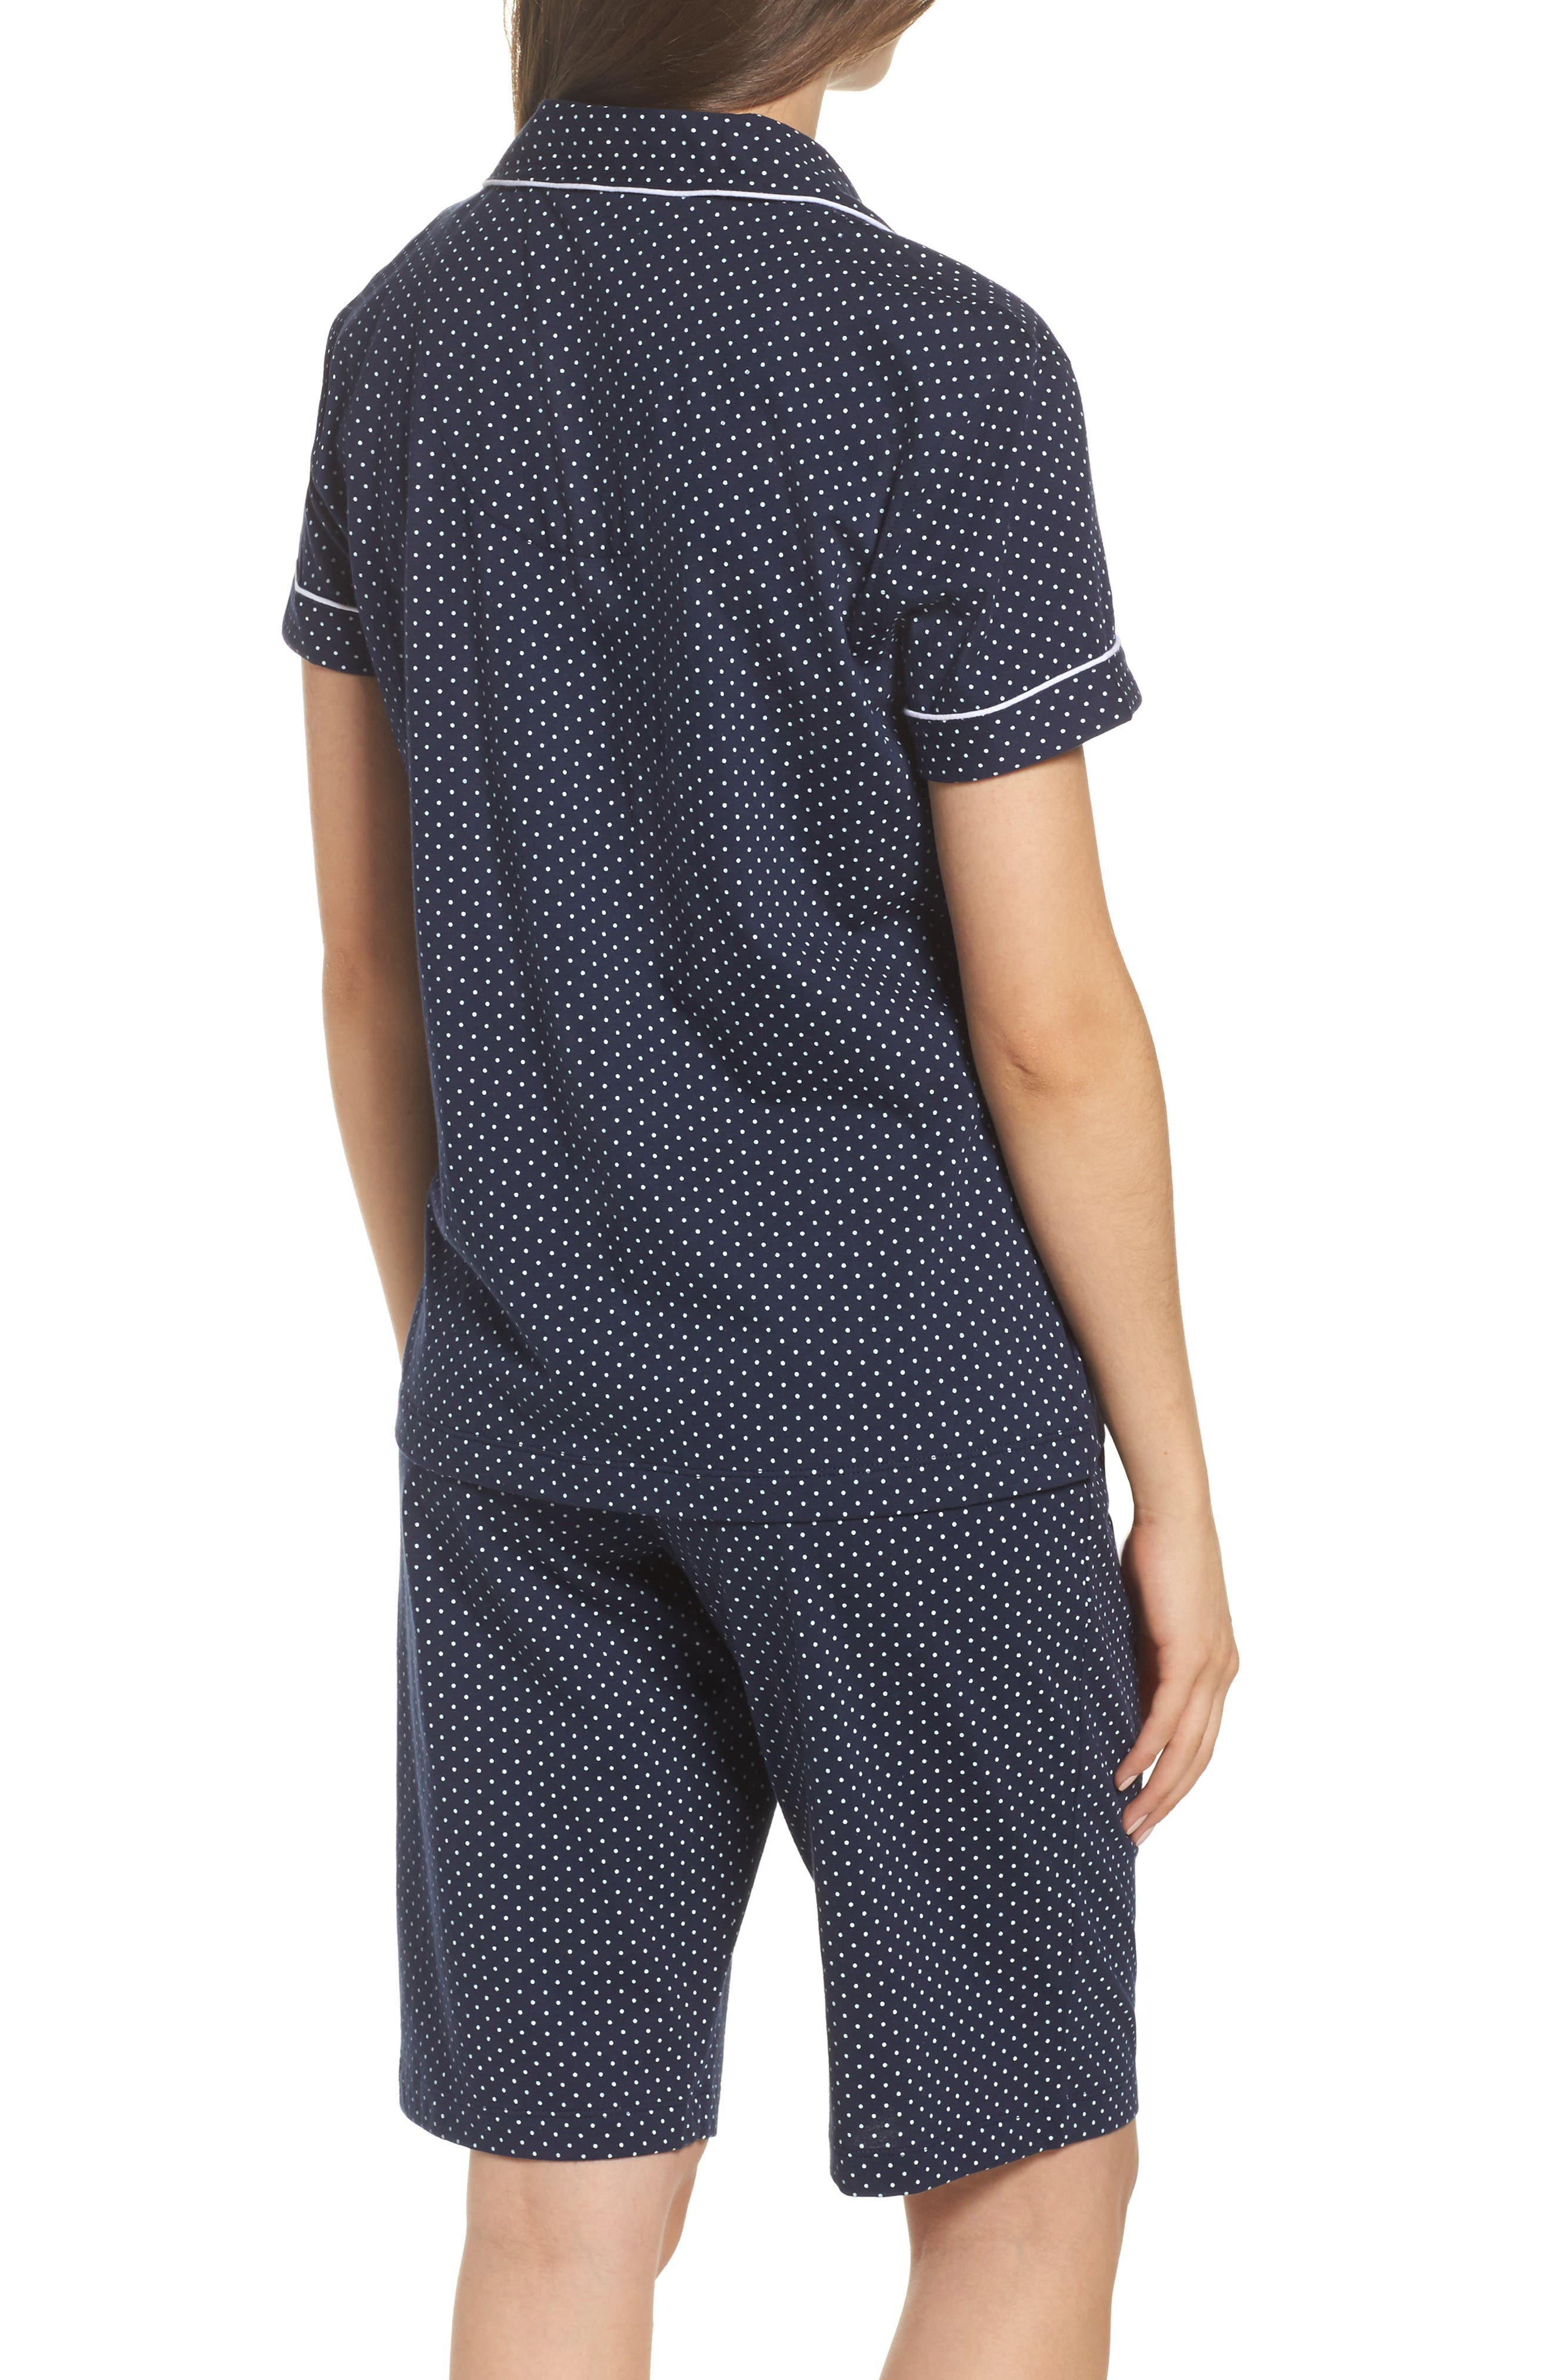 Bermuda Pajamas,                             Alternate thumbnail 2, color,                             Navy Dot